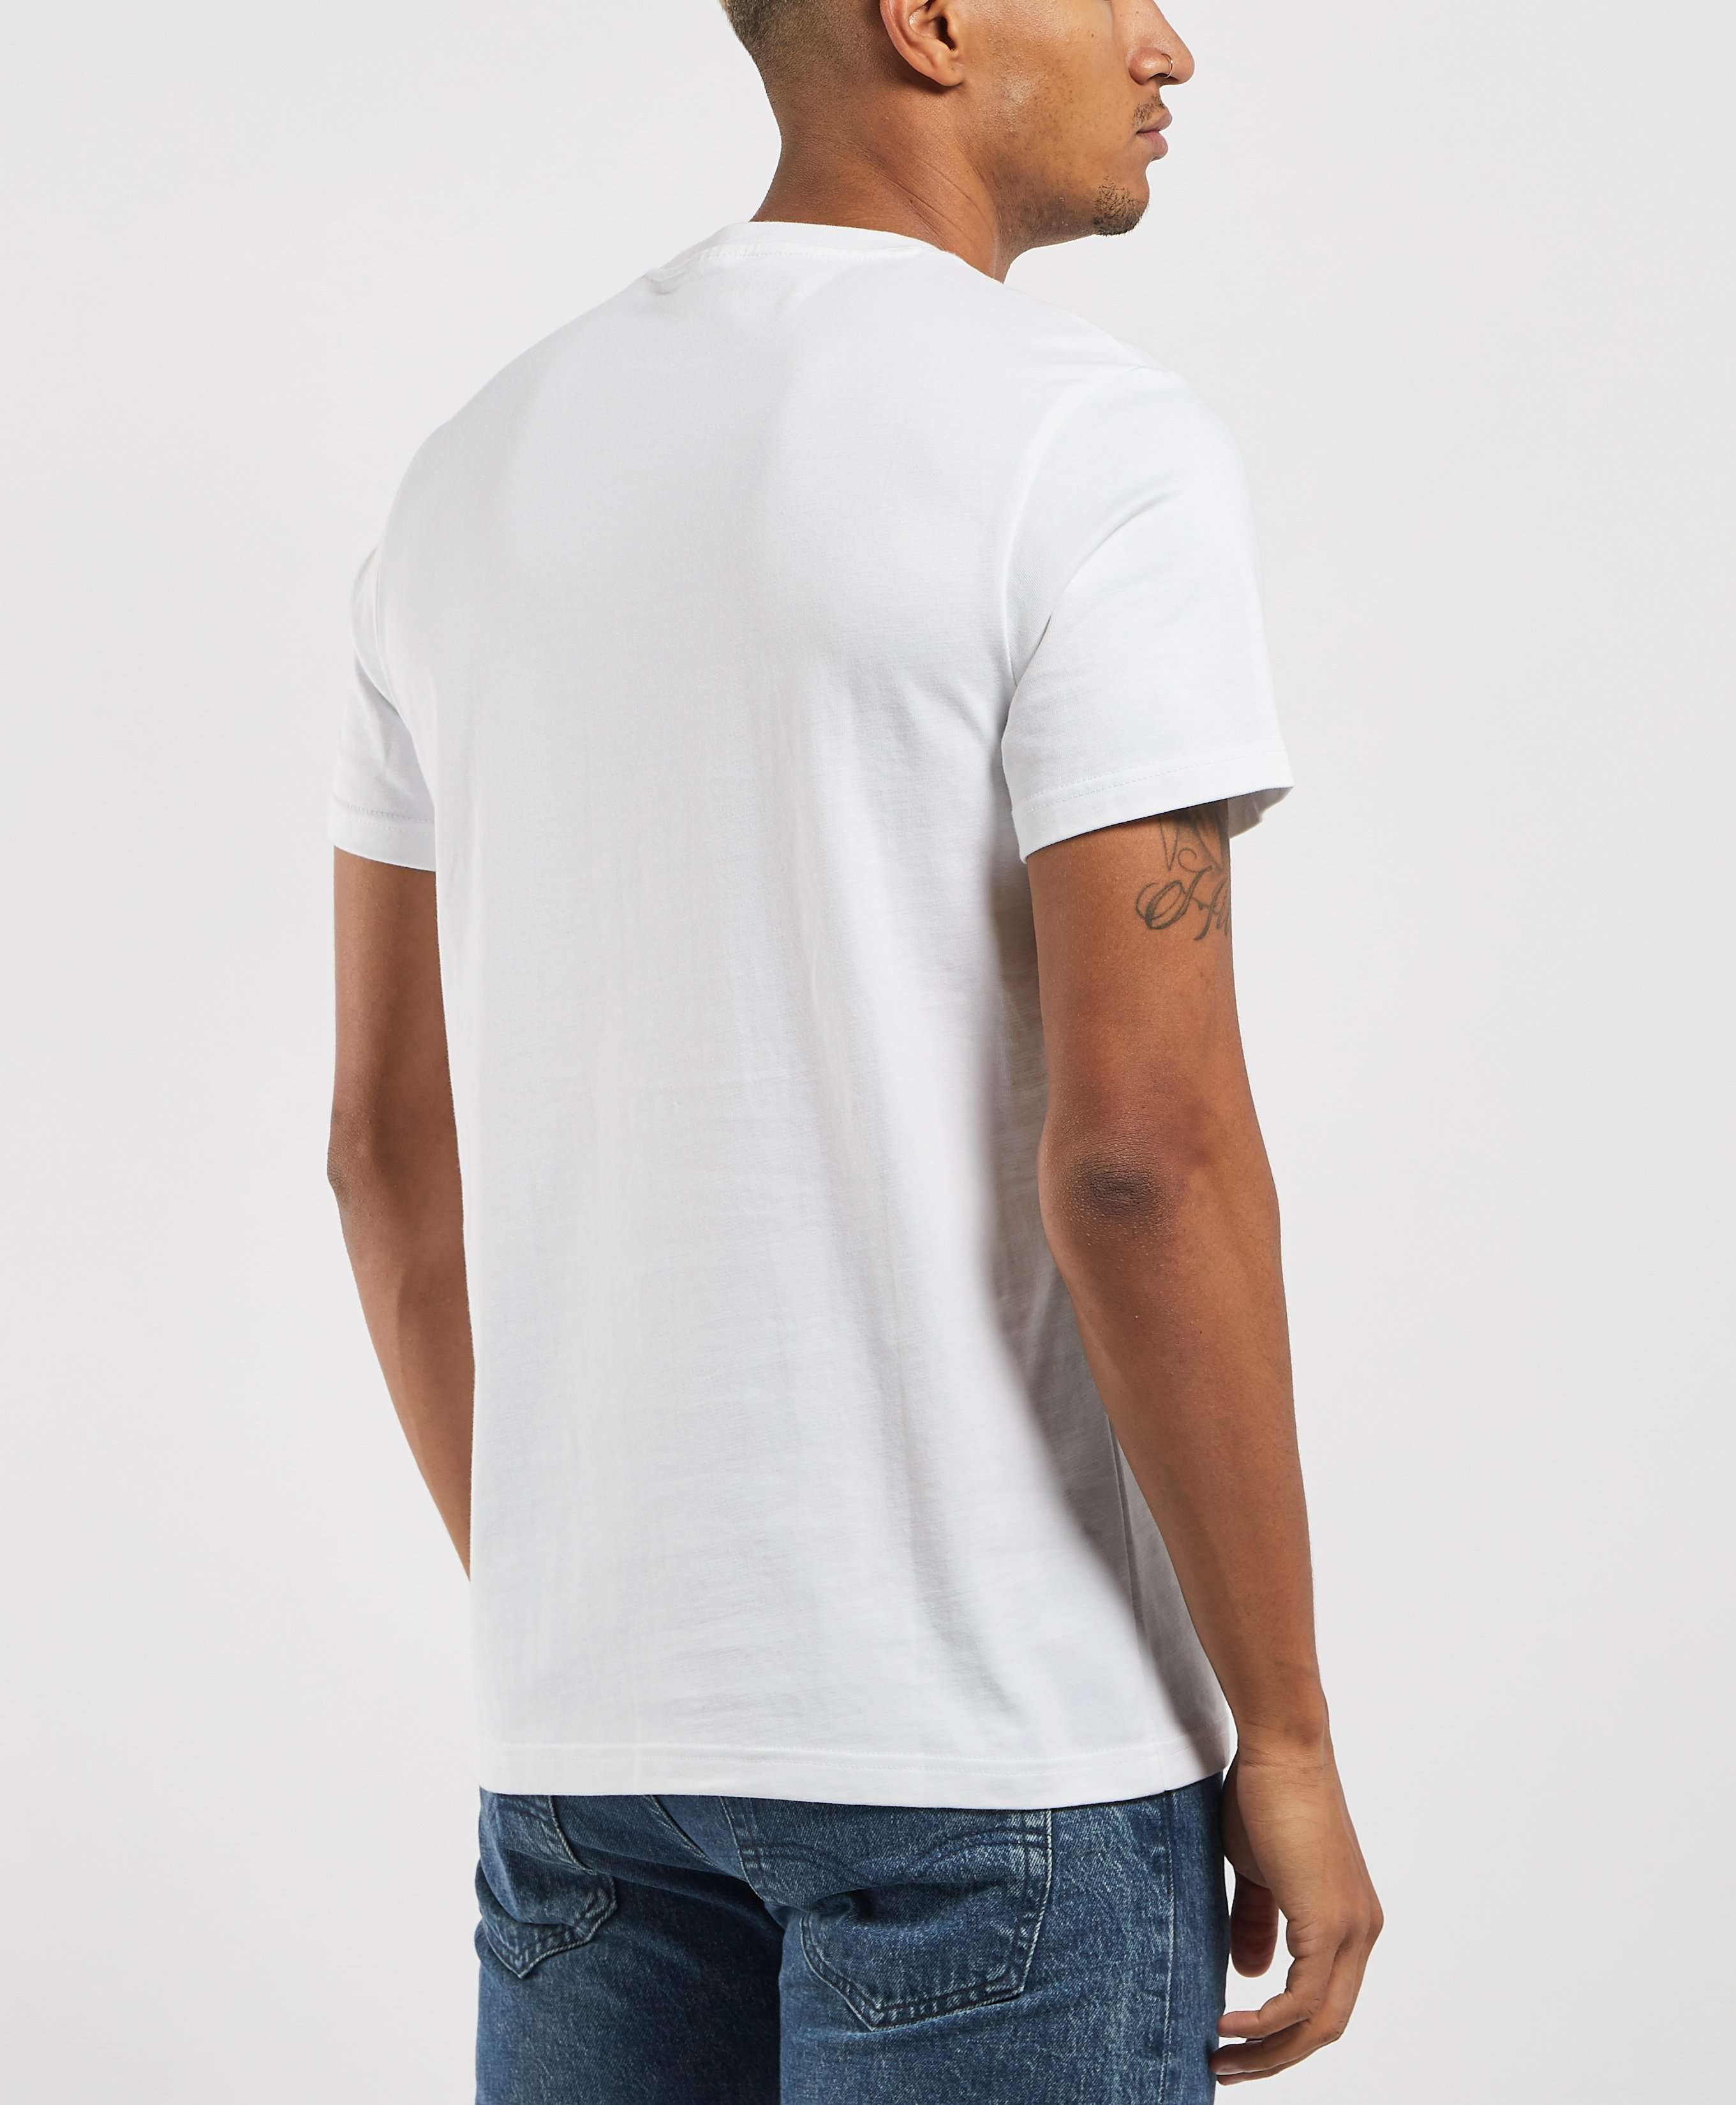 Reebok Short Sleeve Vector Logo T-Shirt